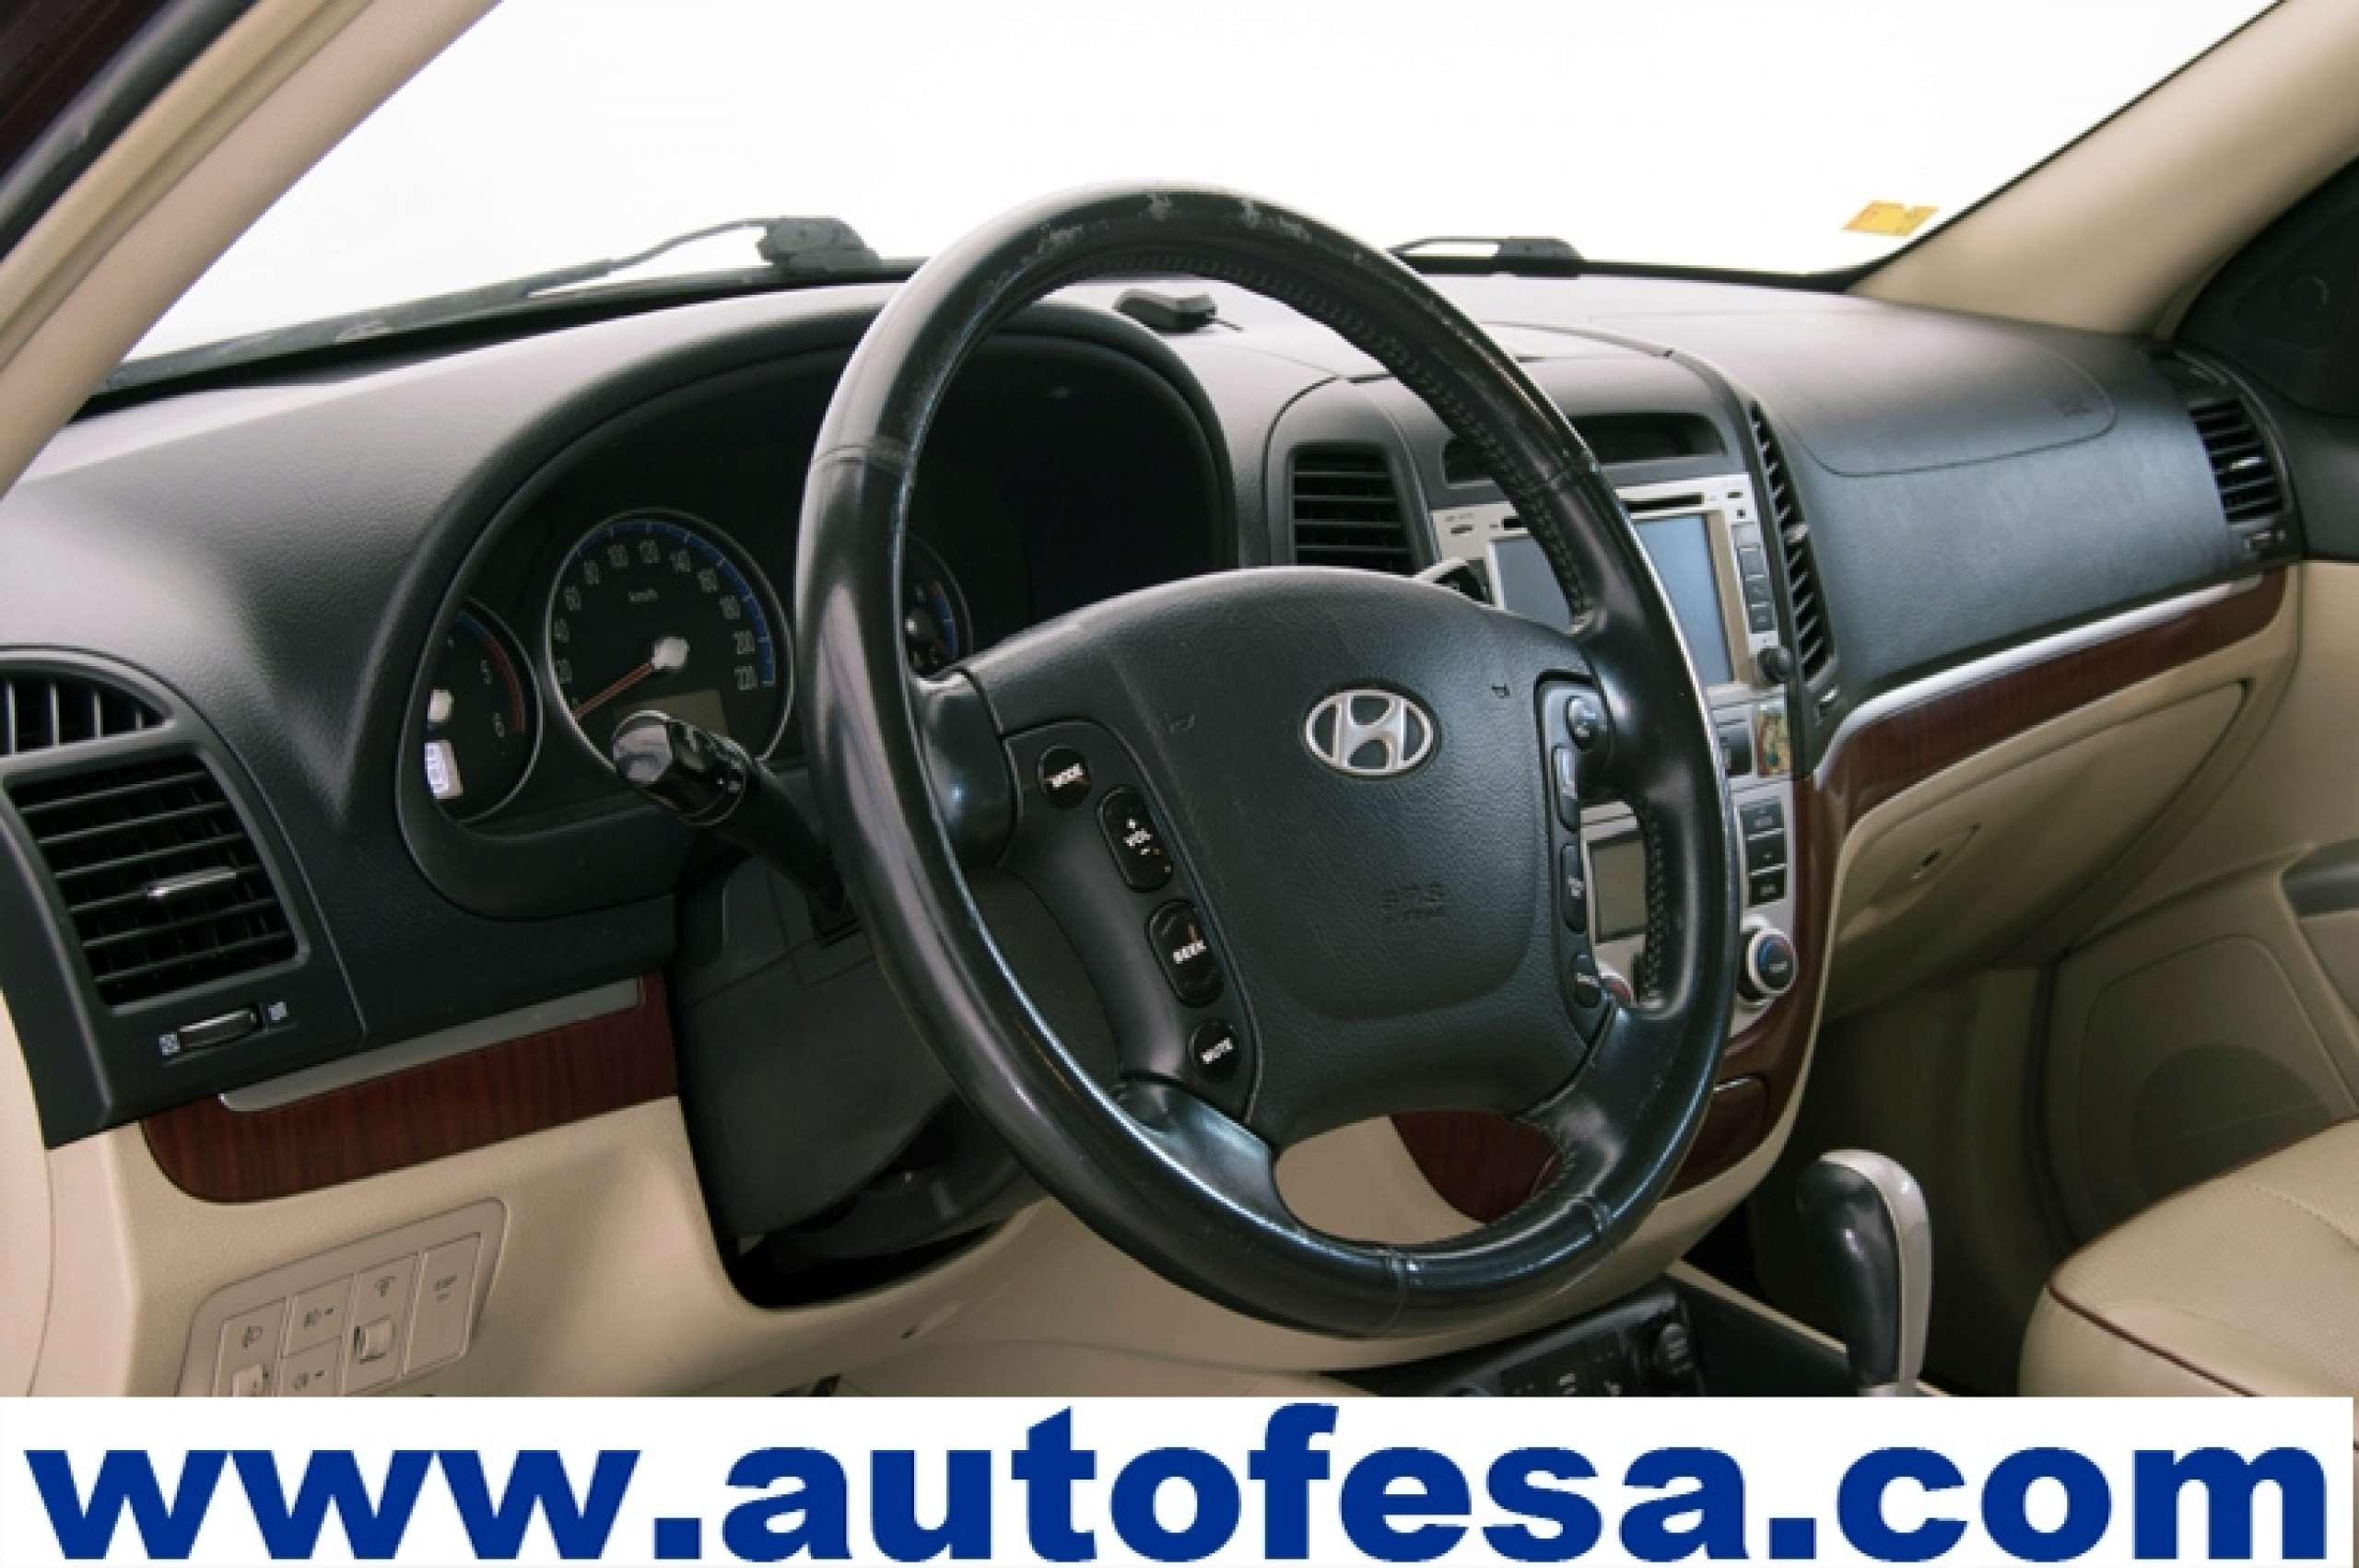 Hyundai Santa Fe 2.2 CRDI 155cv Style Auto 5p - Foto 21